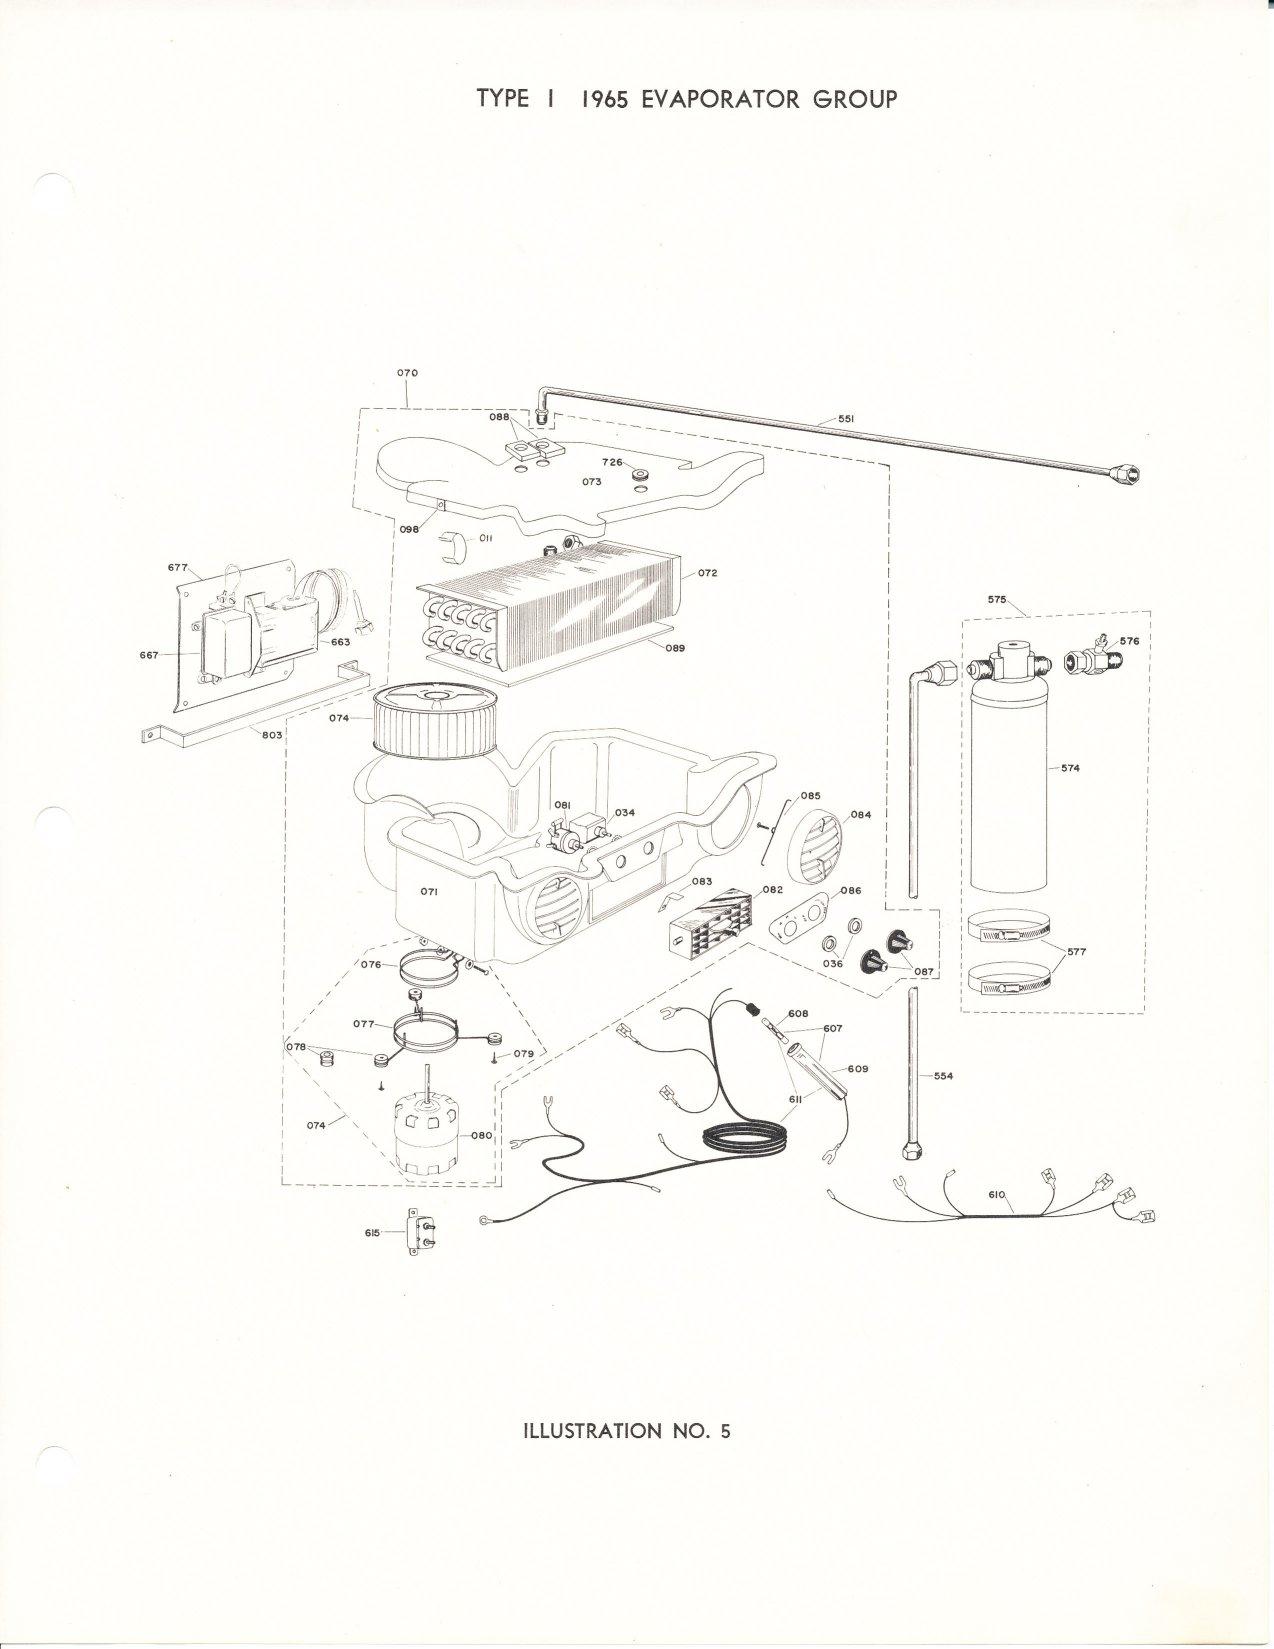 Volkswagen Parts Diagrams With Part Numbers